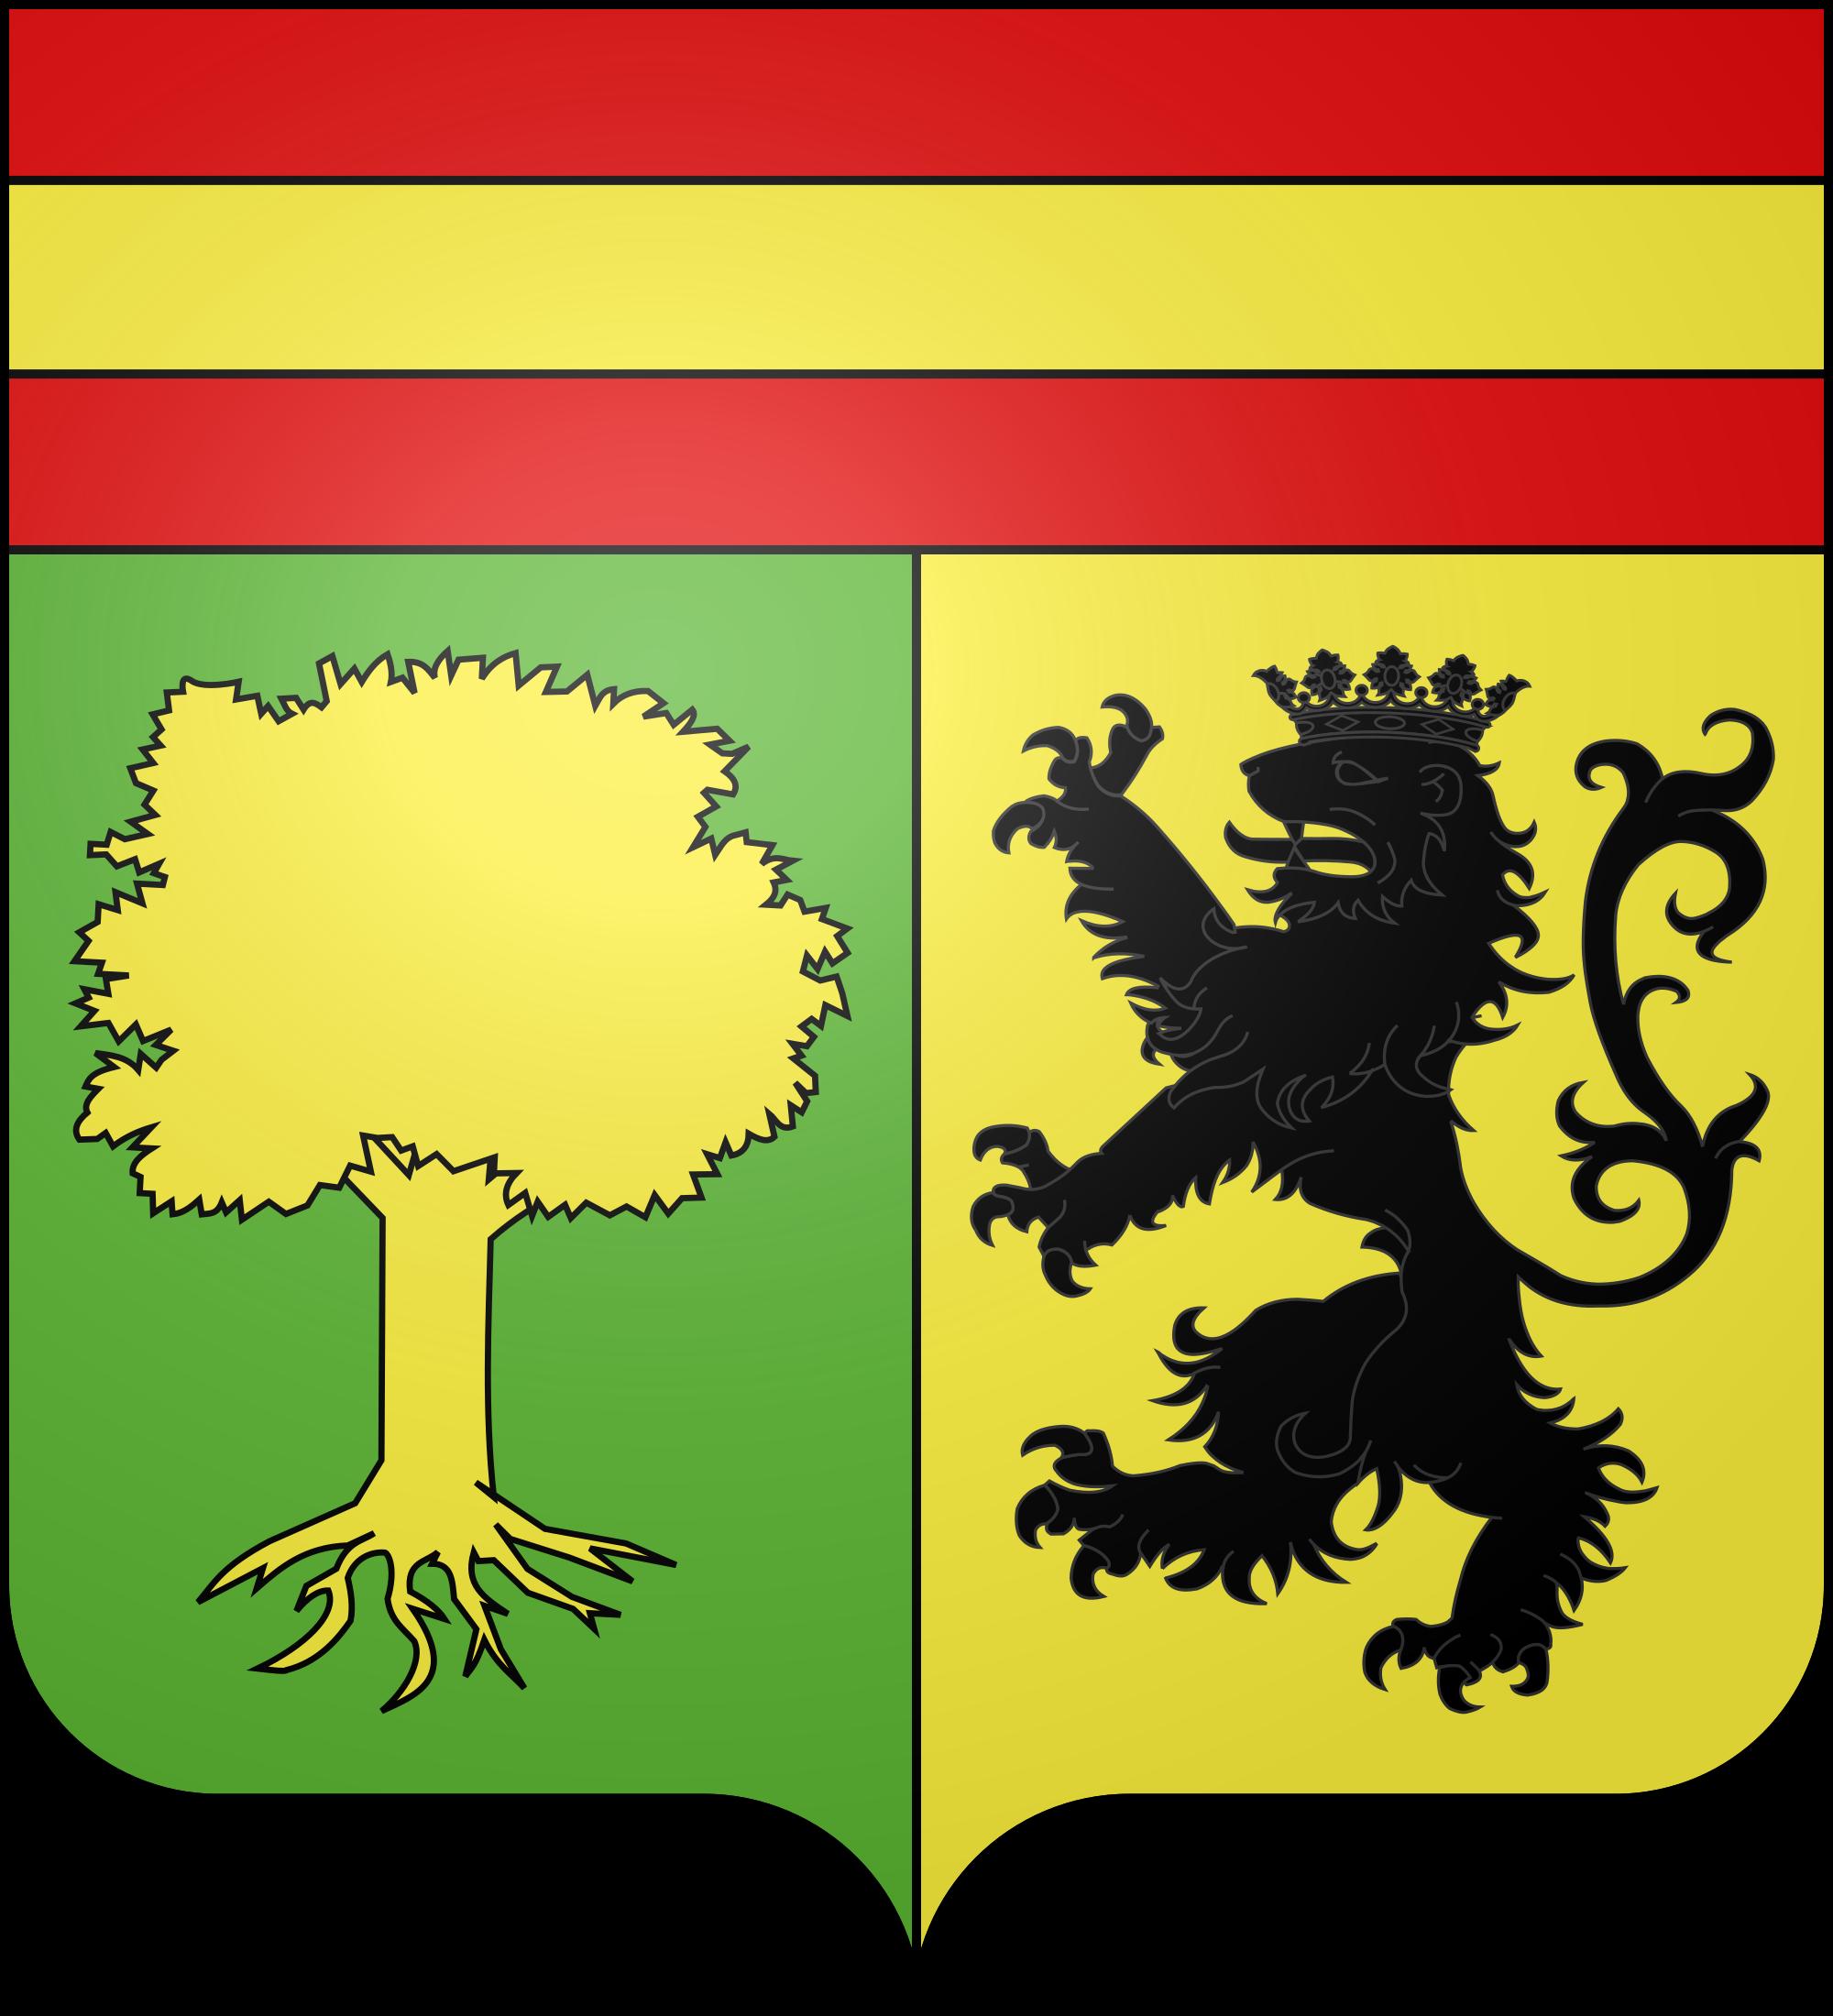 File:Blason de la ville de Hargnies (Ardennes).svg.